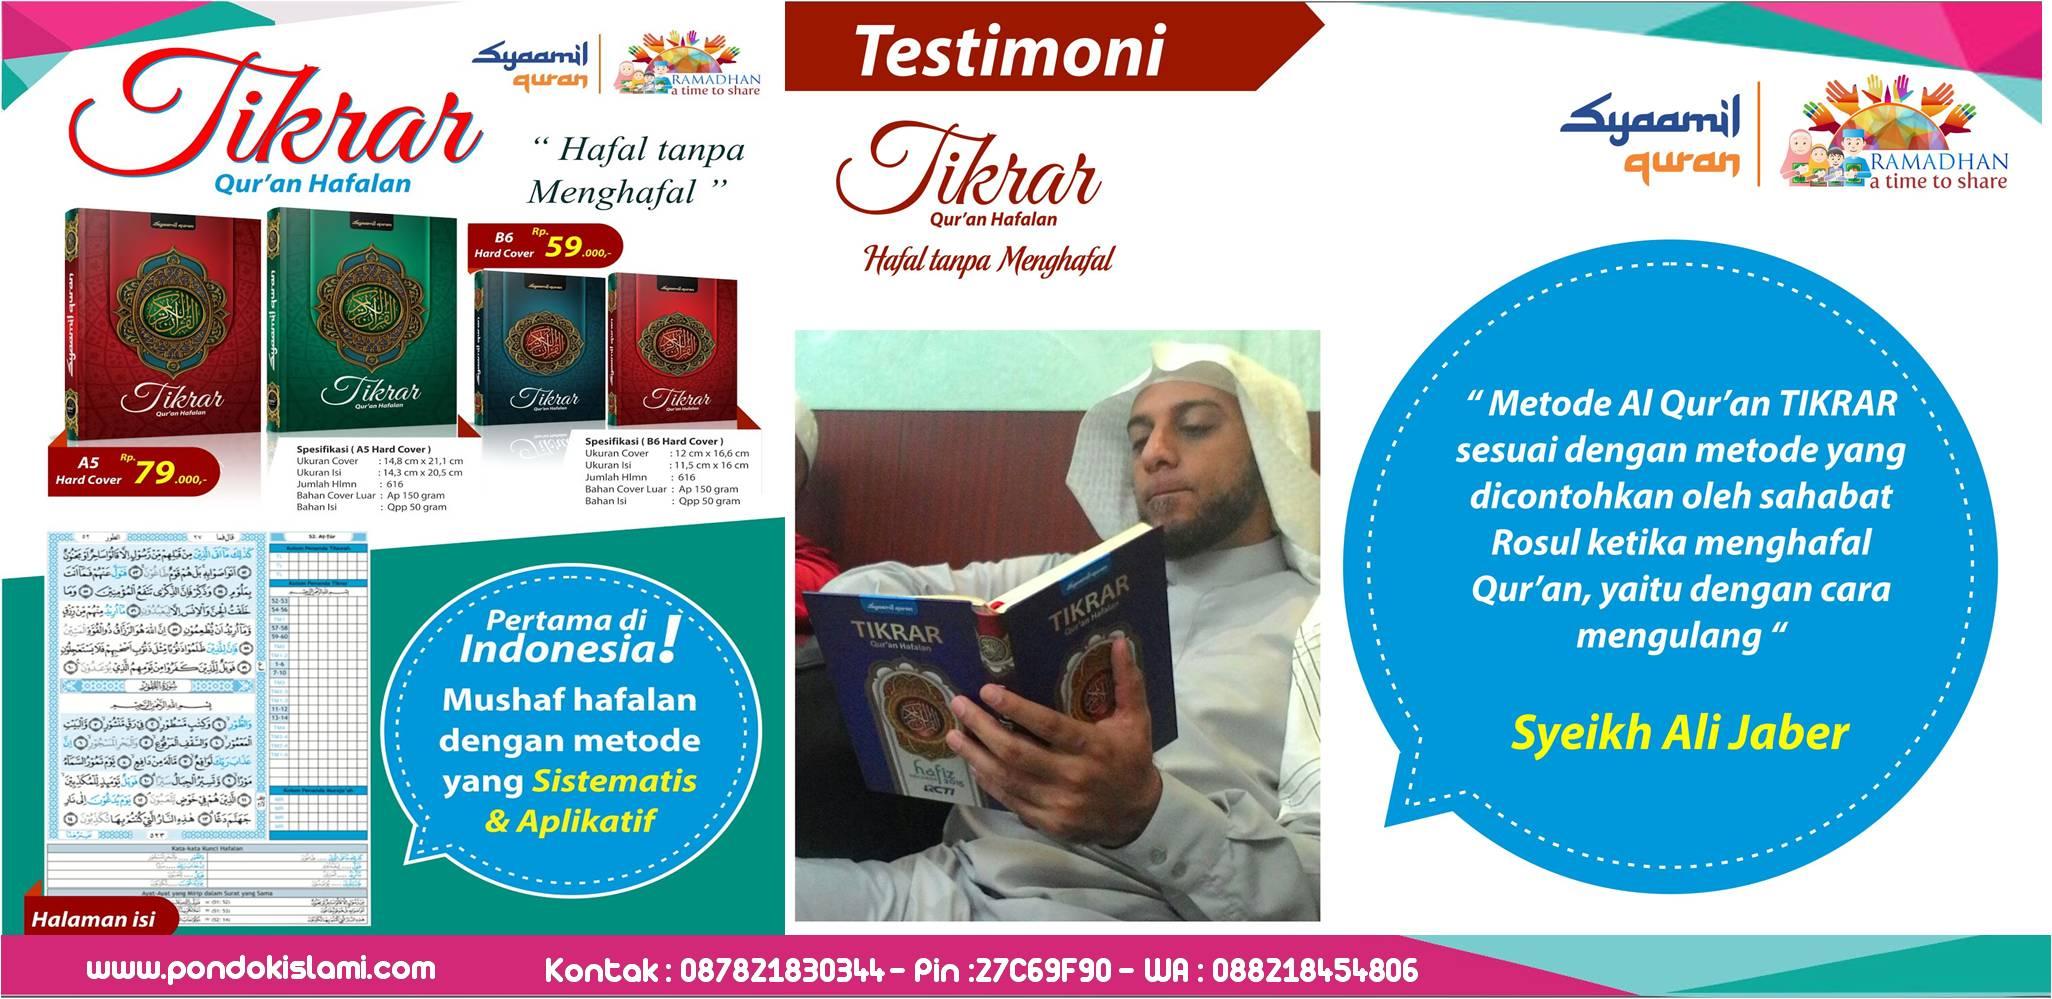 testimoni-Alquran-Tikrar-Syeikh-Ali-Jaber